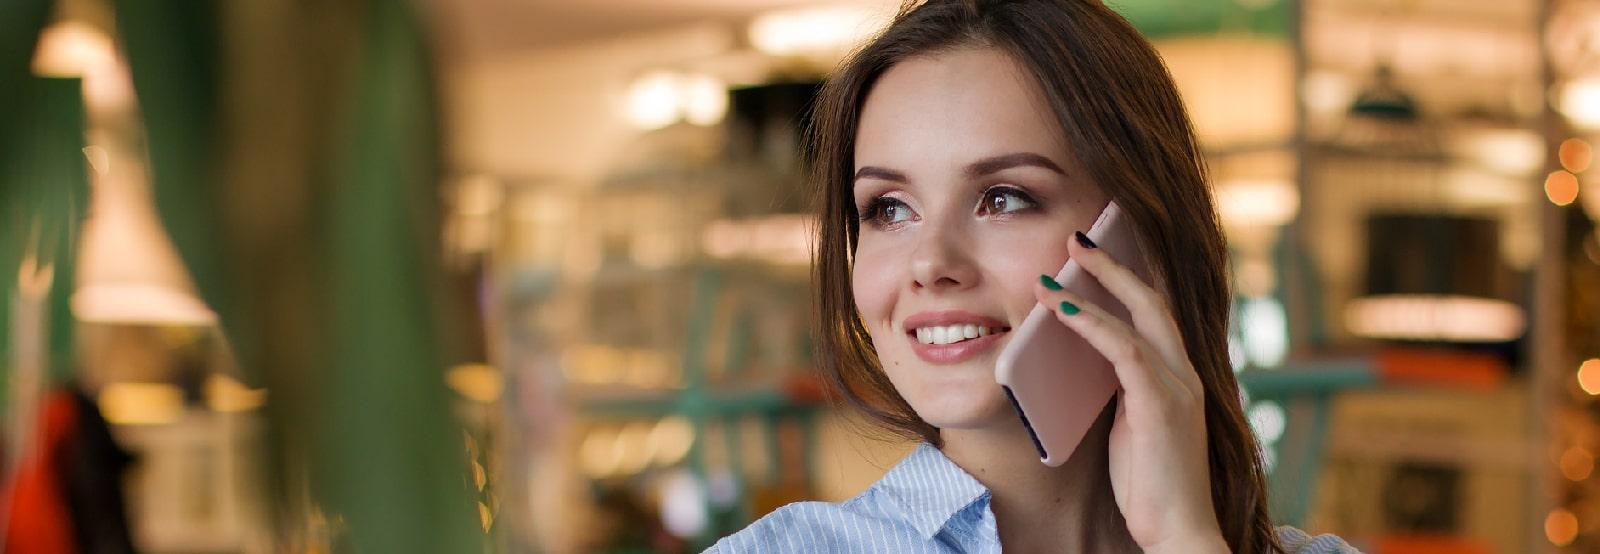 Telecom Customers Loyalty Program